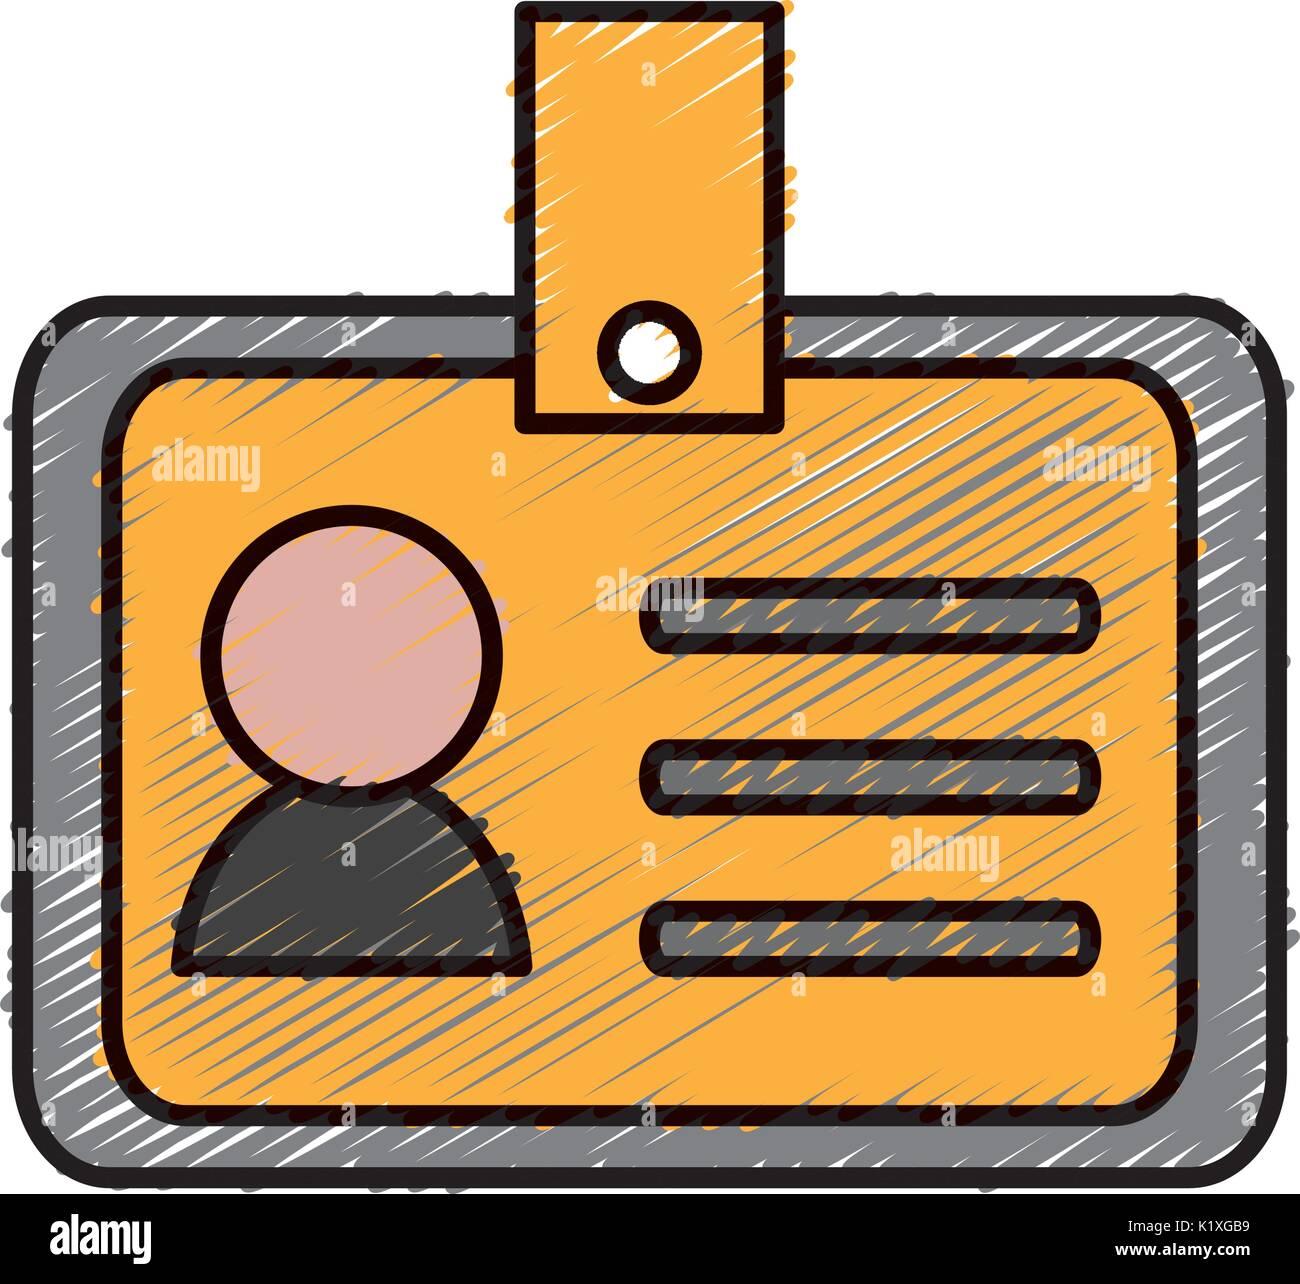 Id card Corporate persönliche Identität icon Stockbild